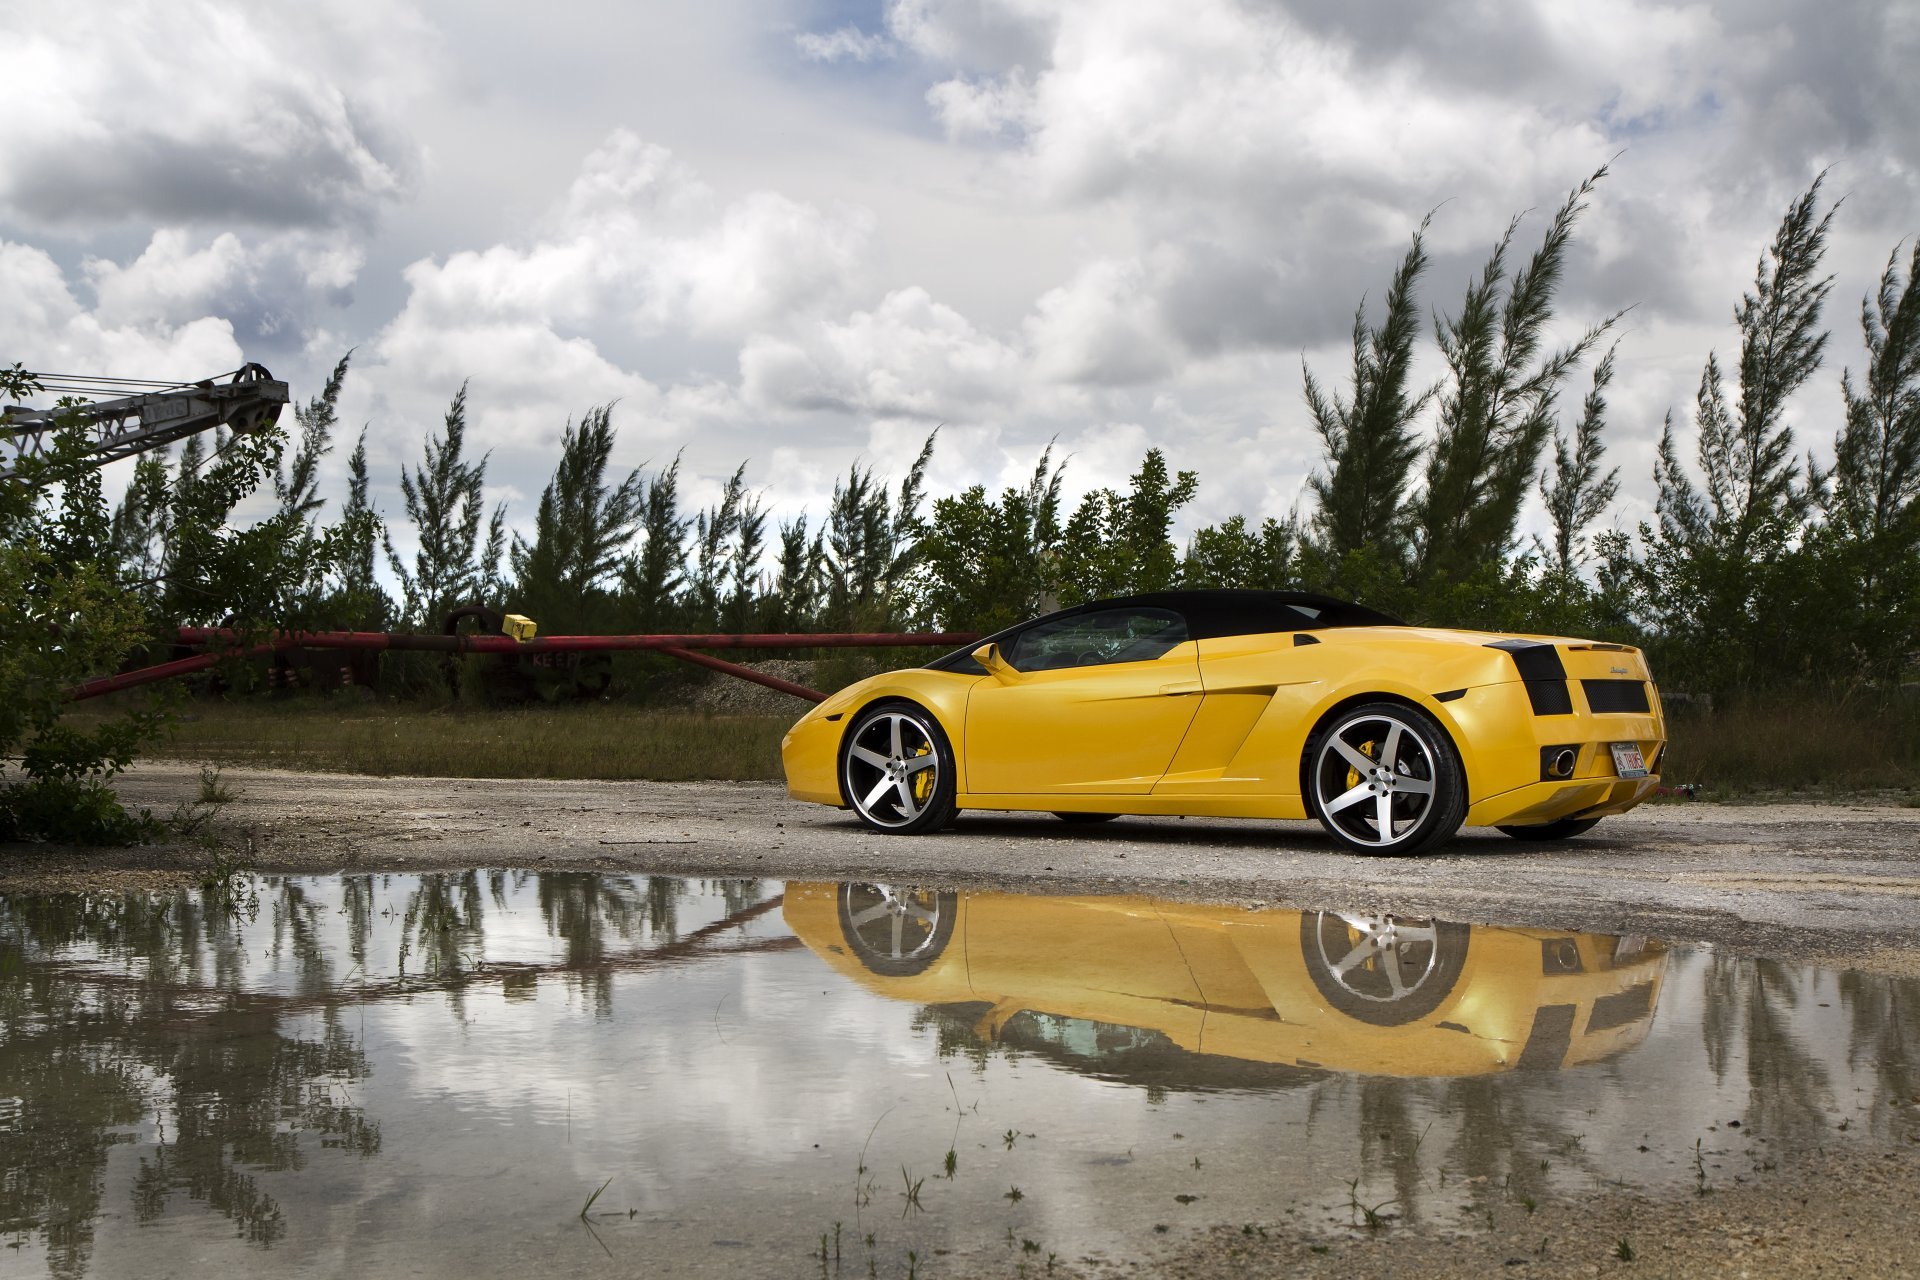 Картинка, крутые картинки про машины